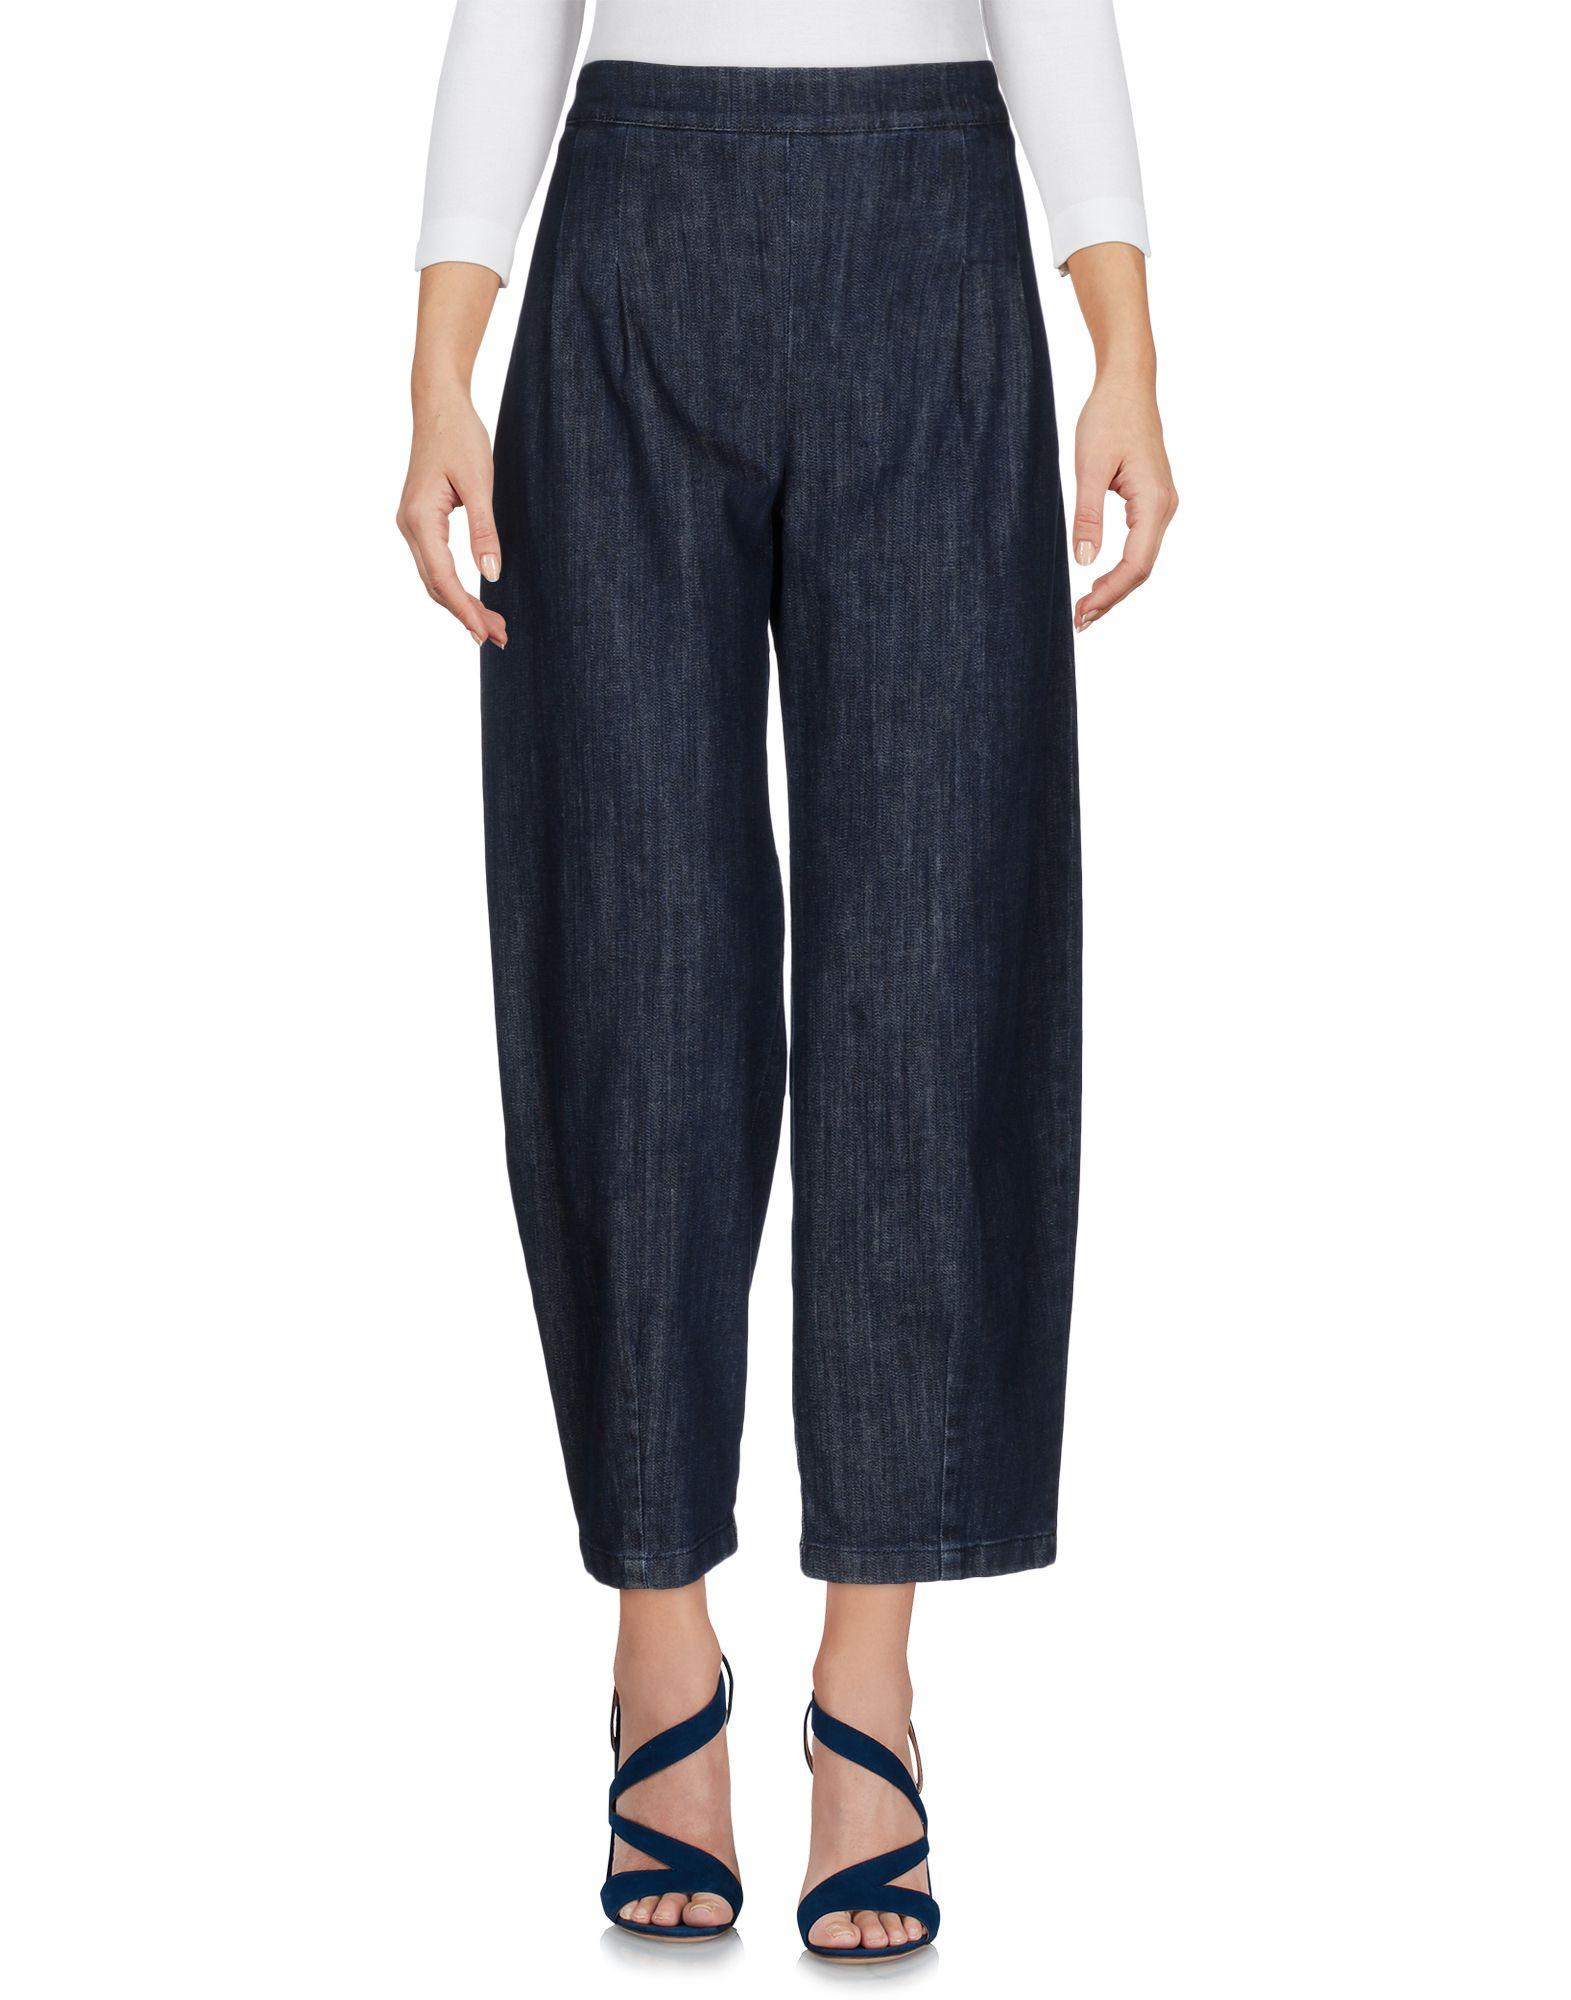 цена  MIKI THUMB Джинсовые брюки  онлайн в 2017 году